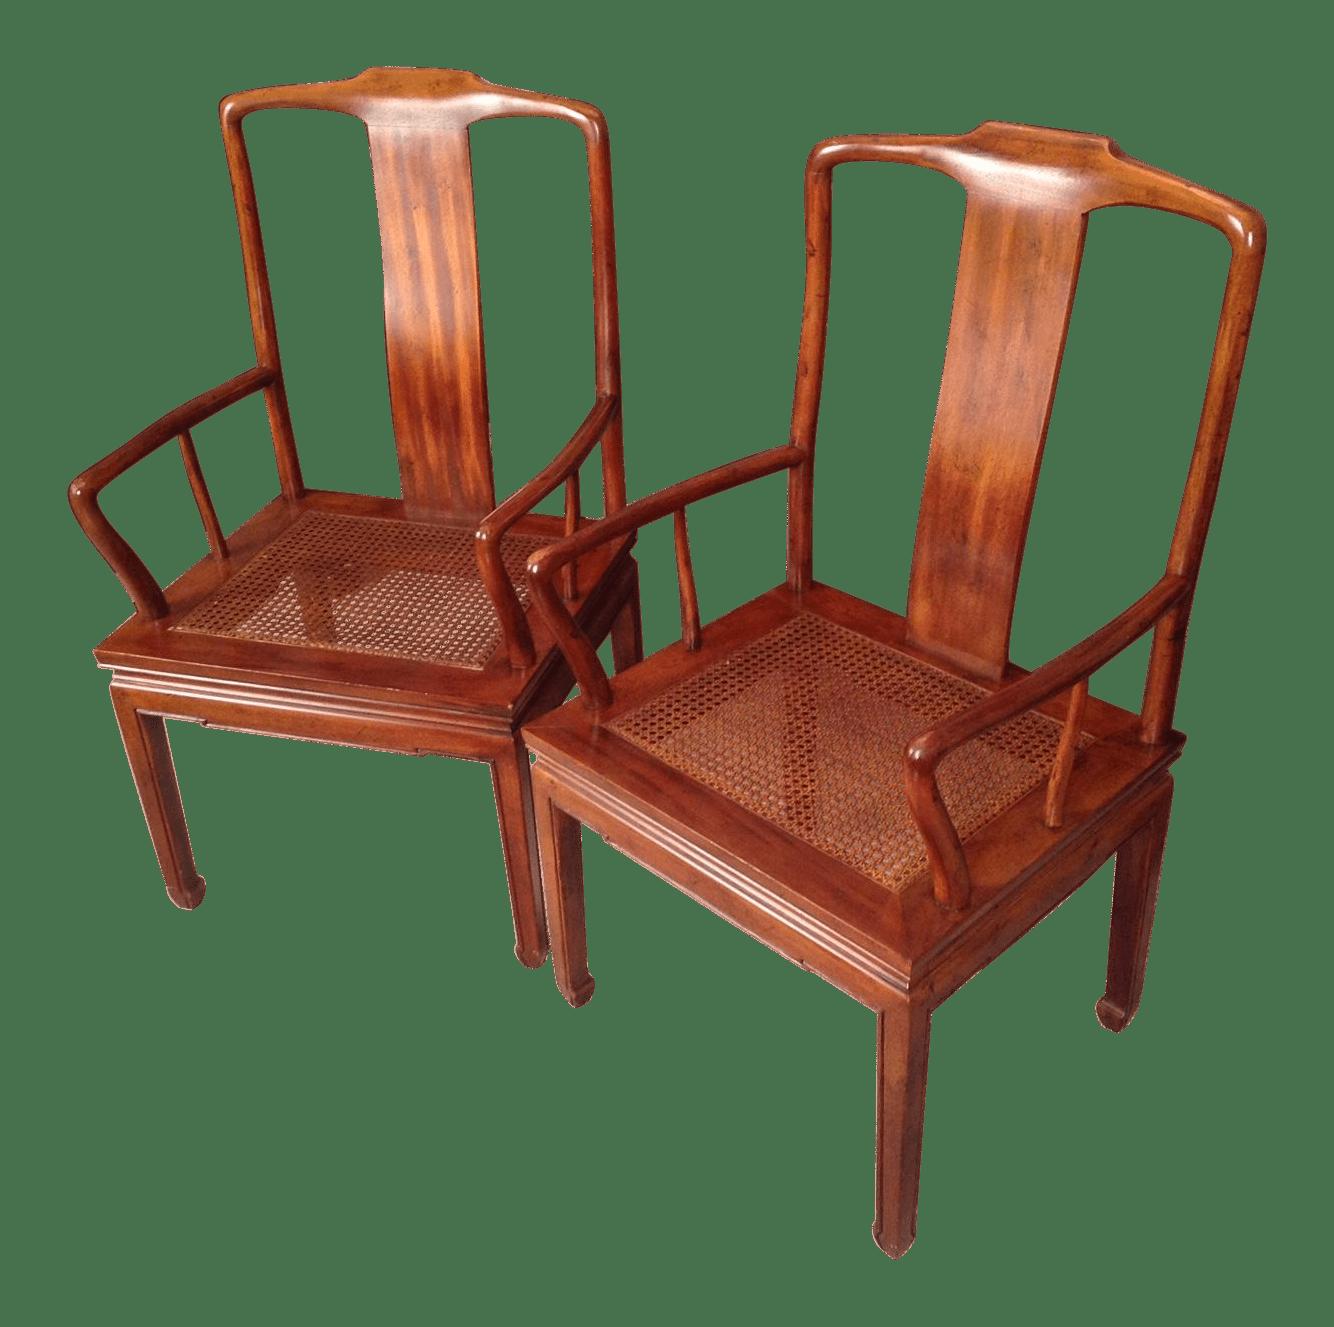 henredon asian dining chairs cream wingback chair cane arm pair chairish